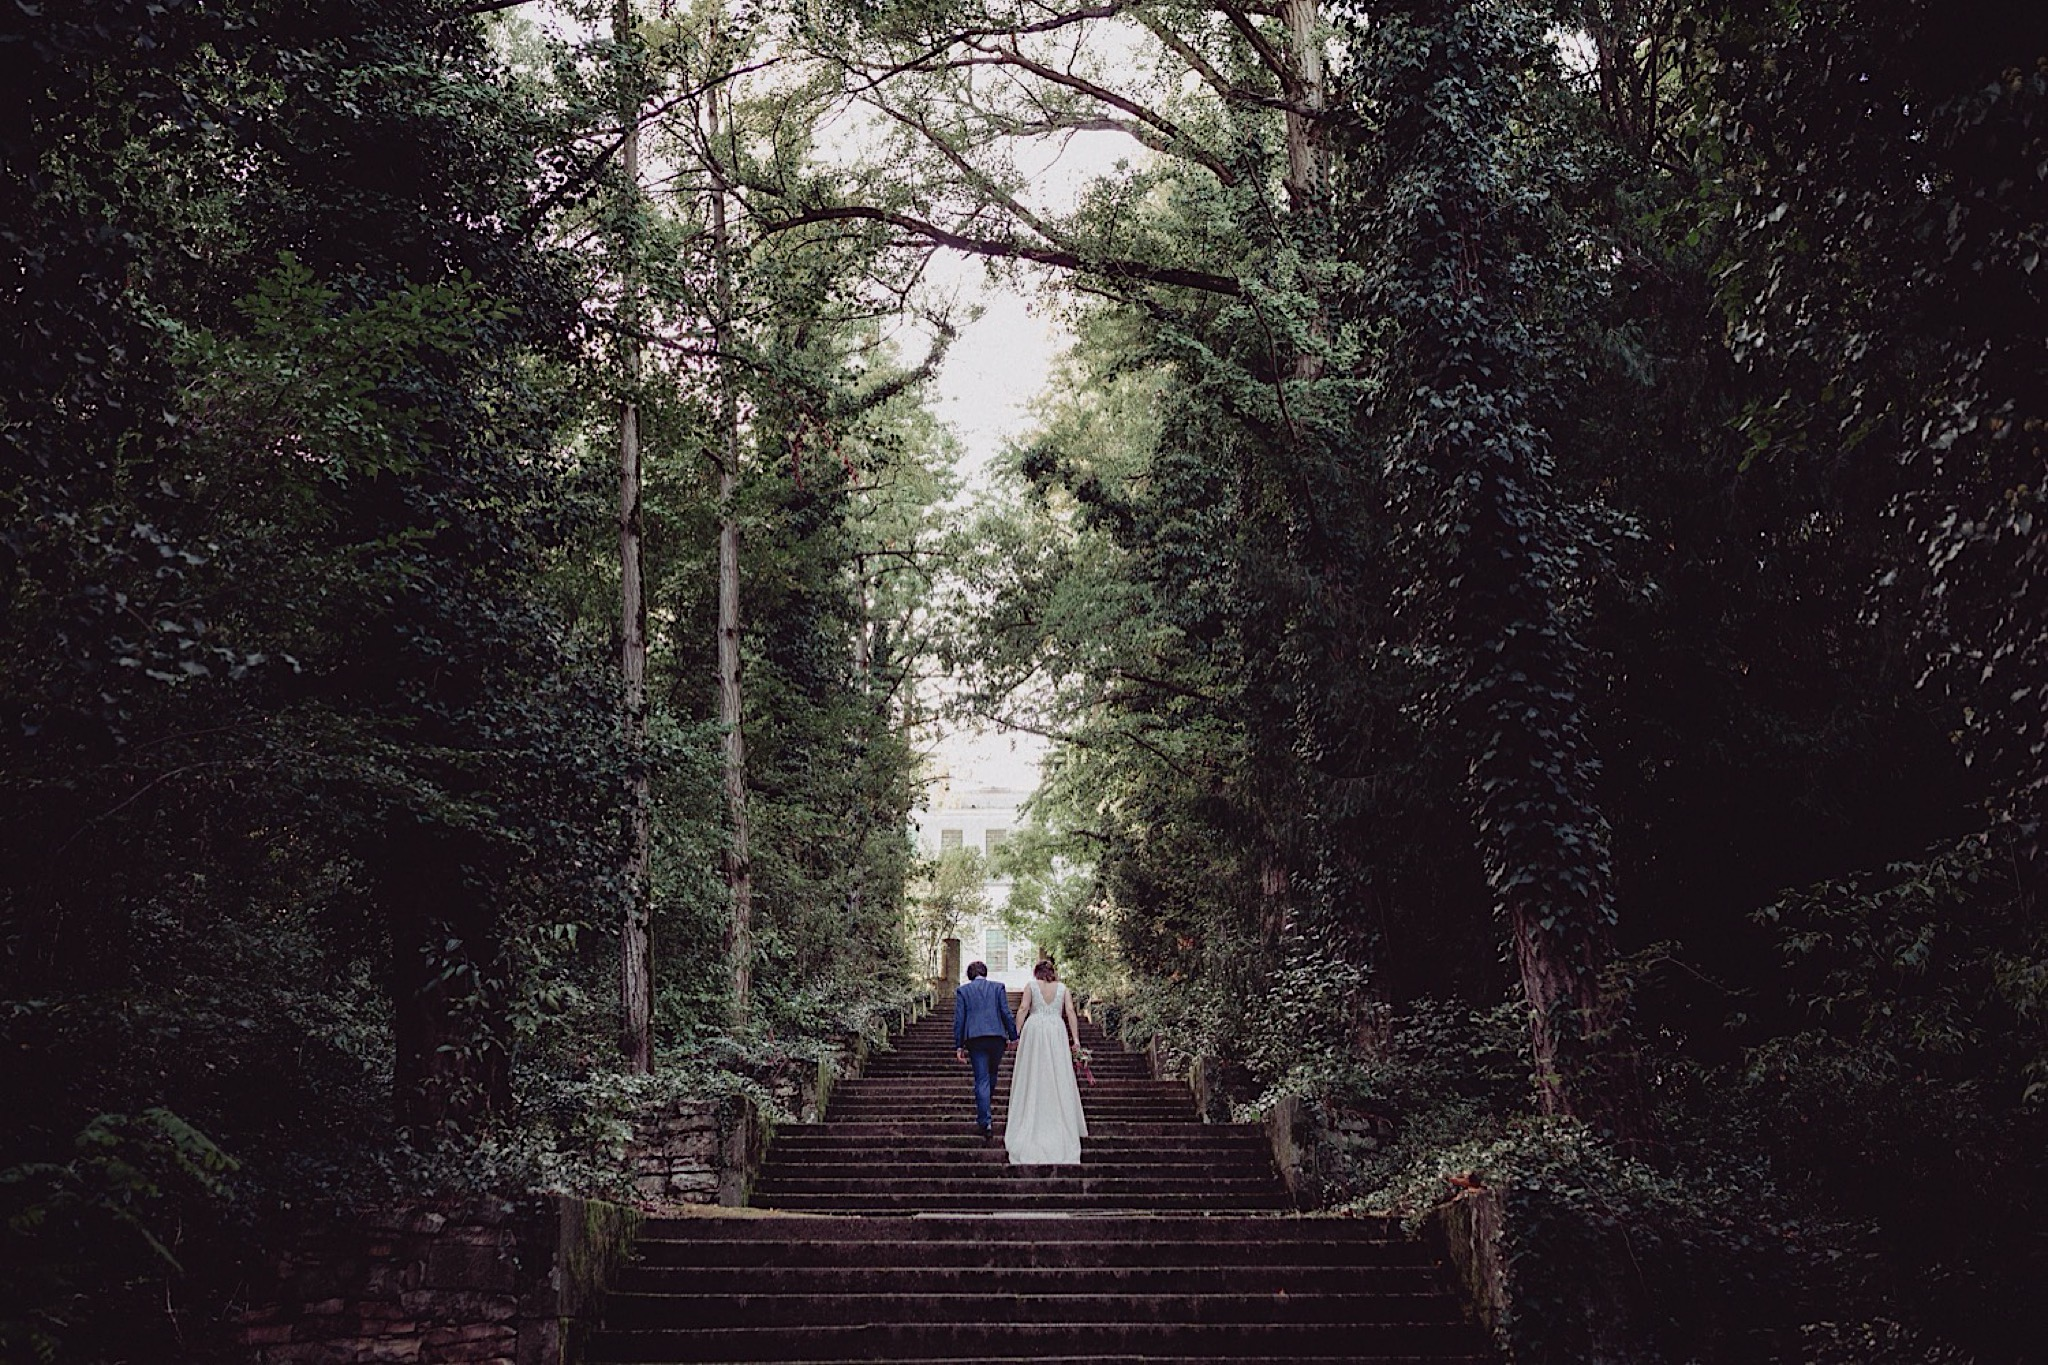 fotografo-matrimonio-villa-papafava-frassanelle-49